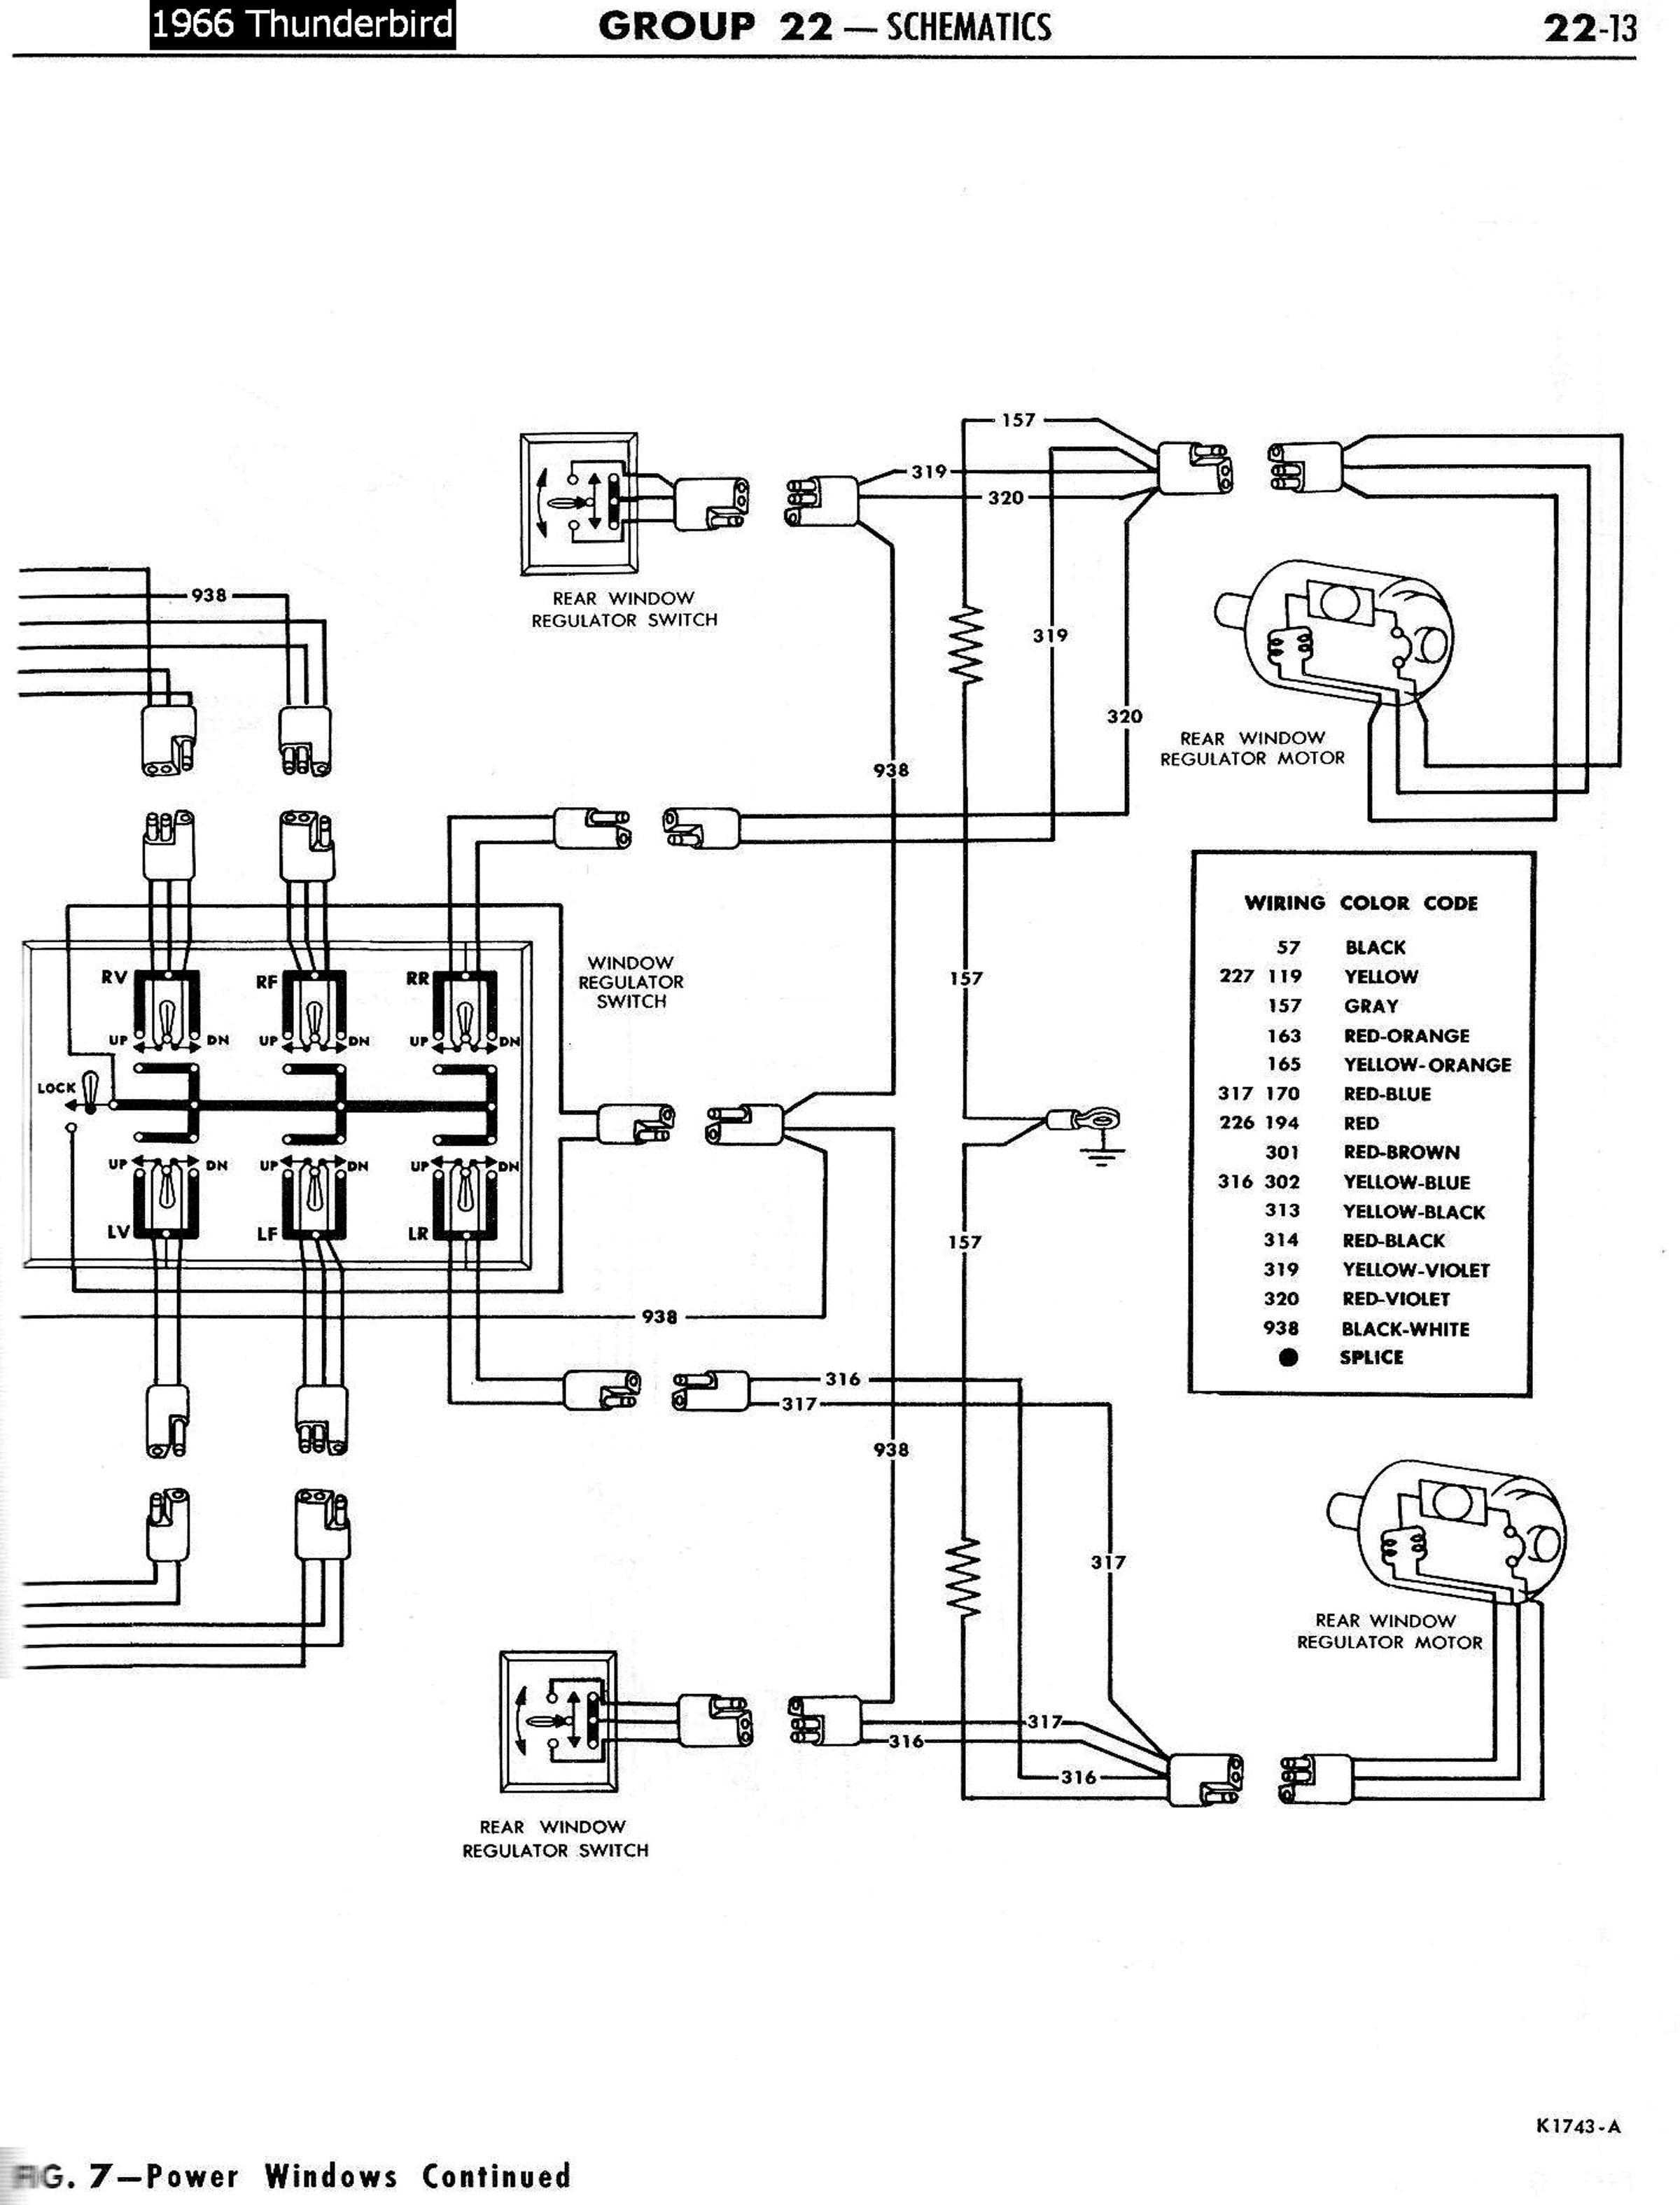 Turn Signal Flasher Diagram Wiring Harley Motorcycle Elegant Of Related Post